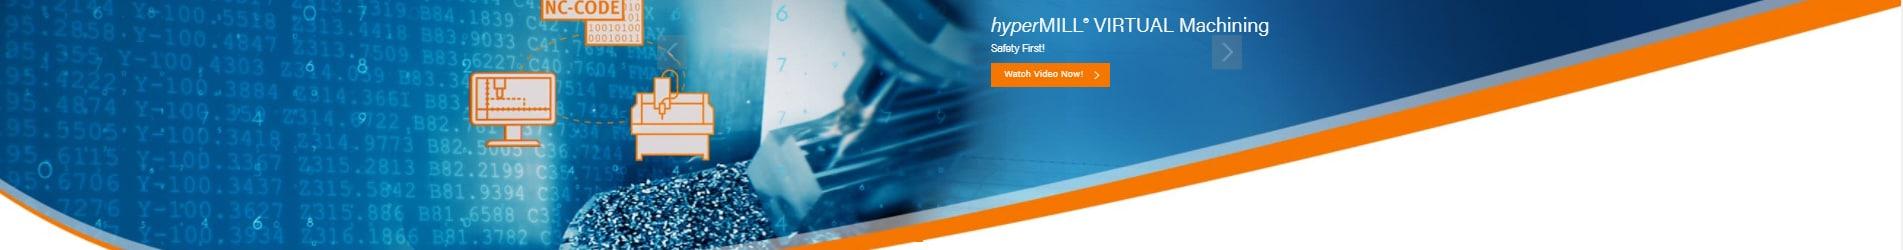 hyperMILL Symulacje - virtual machining